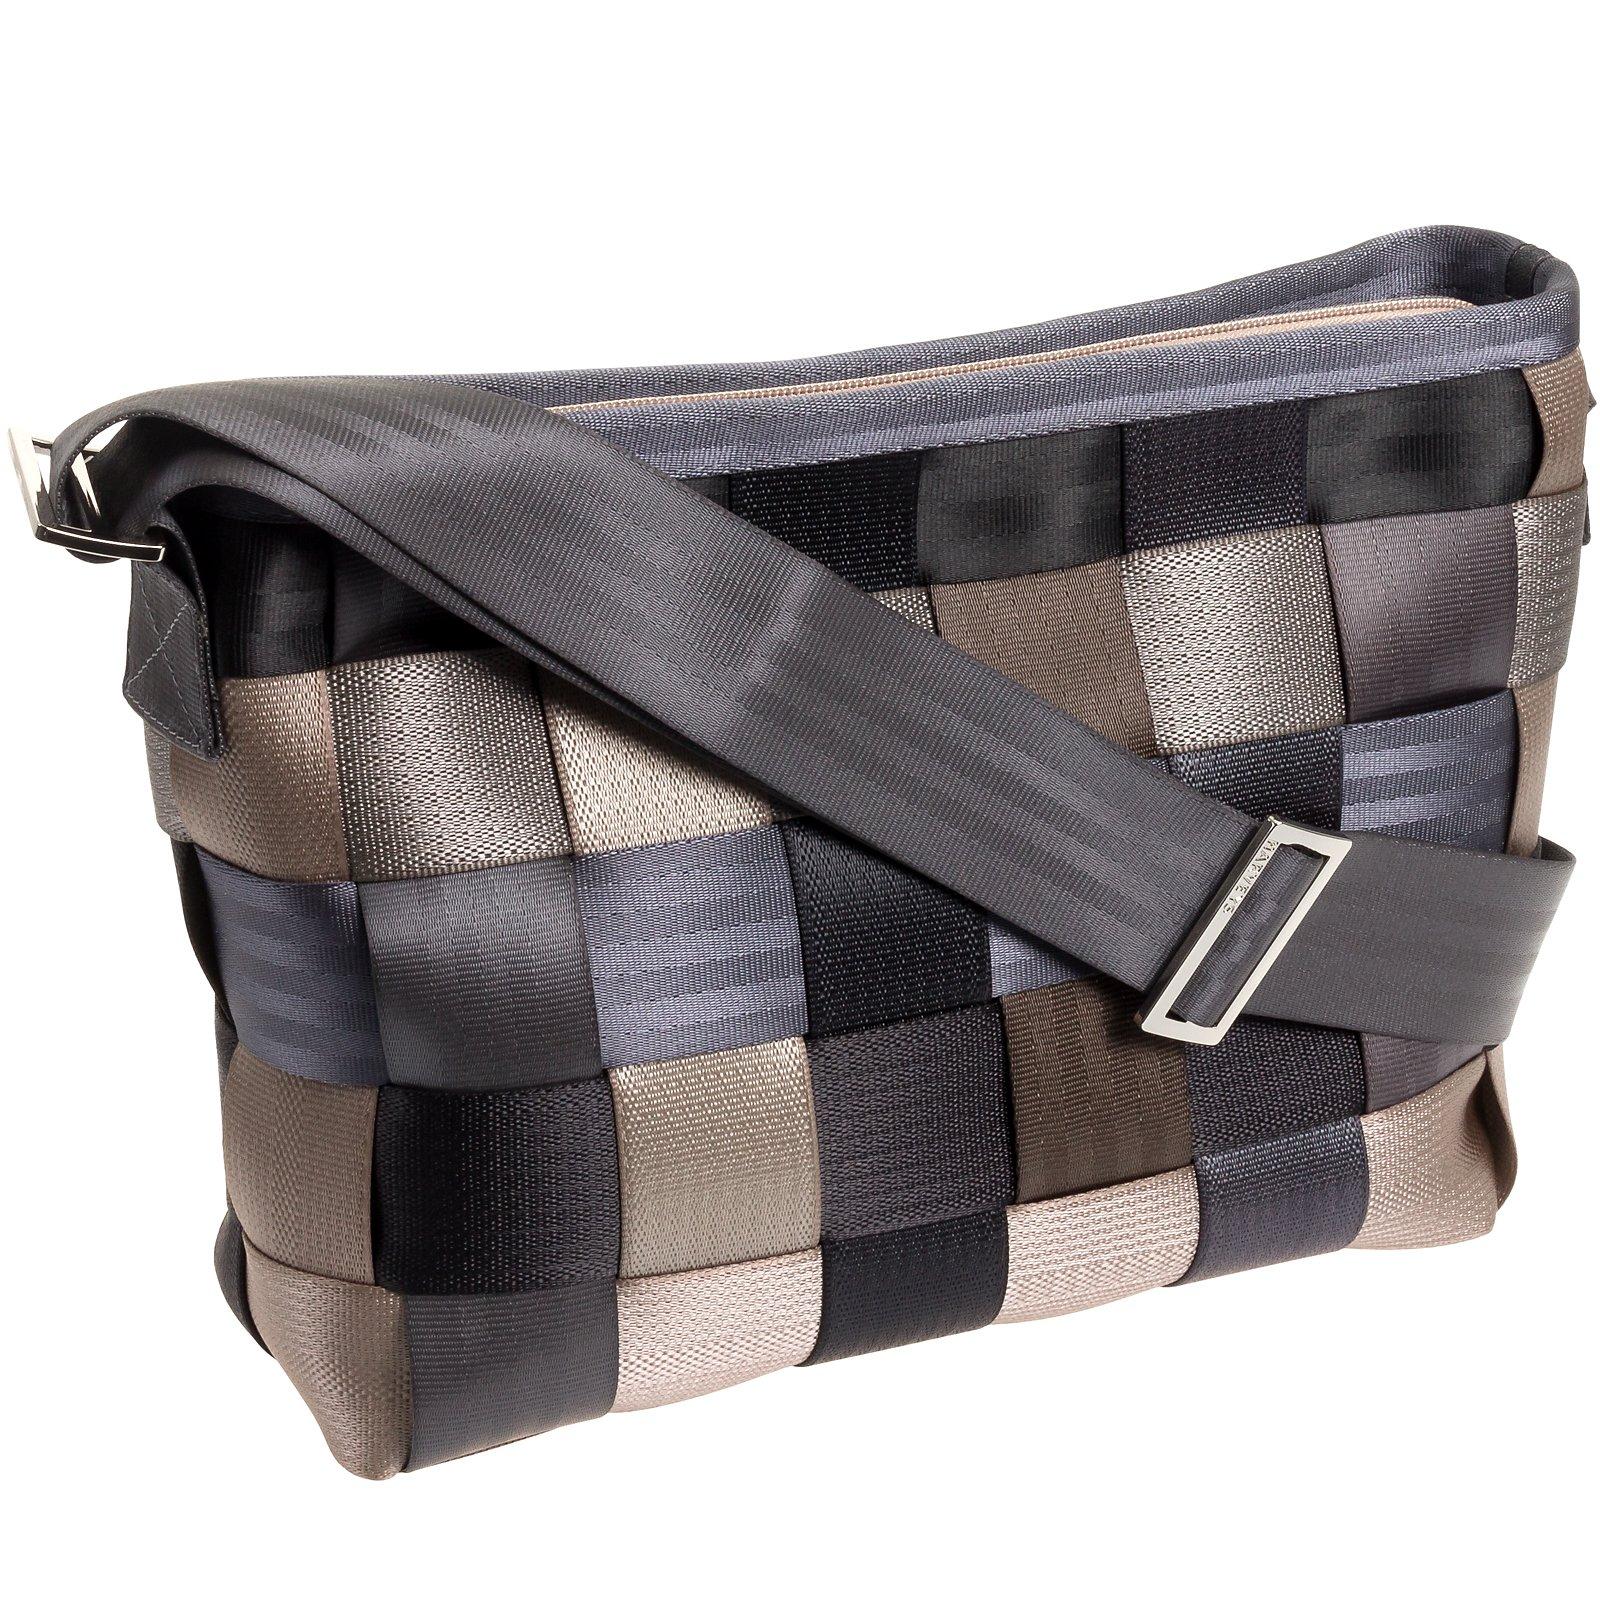 Harveys Womens Seatbelt Convertible Tote Bag (Treecycle)